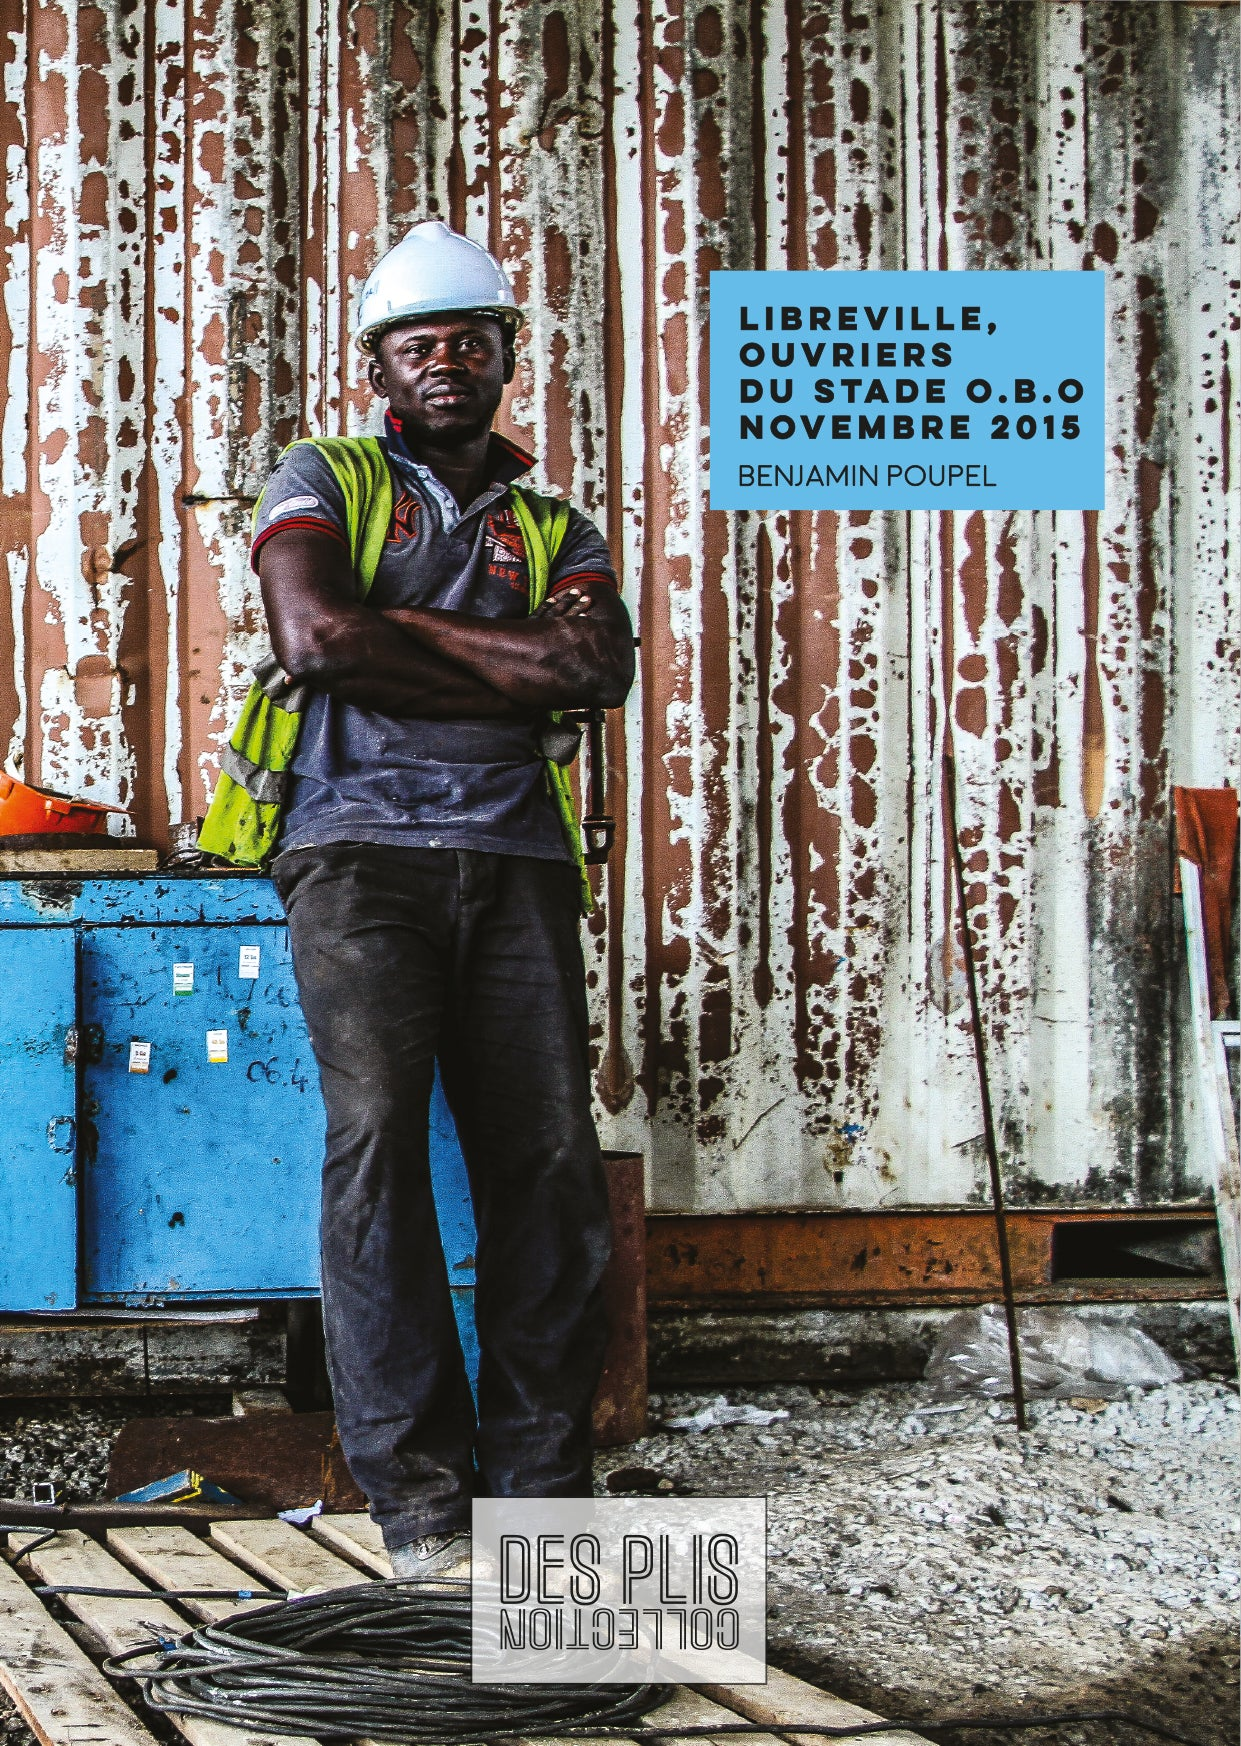 Image of Libreville, les ouvriers du stade O.B.O. de Benjamin Poupel